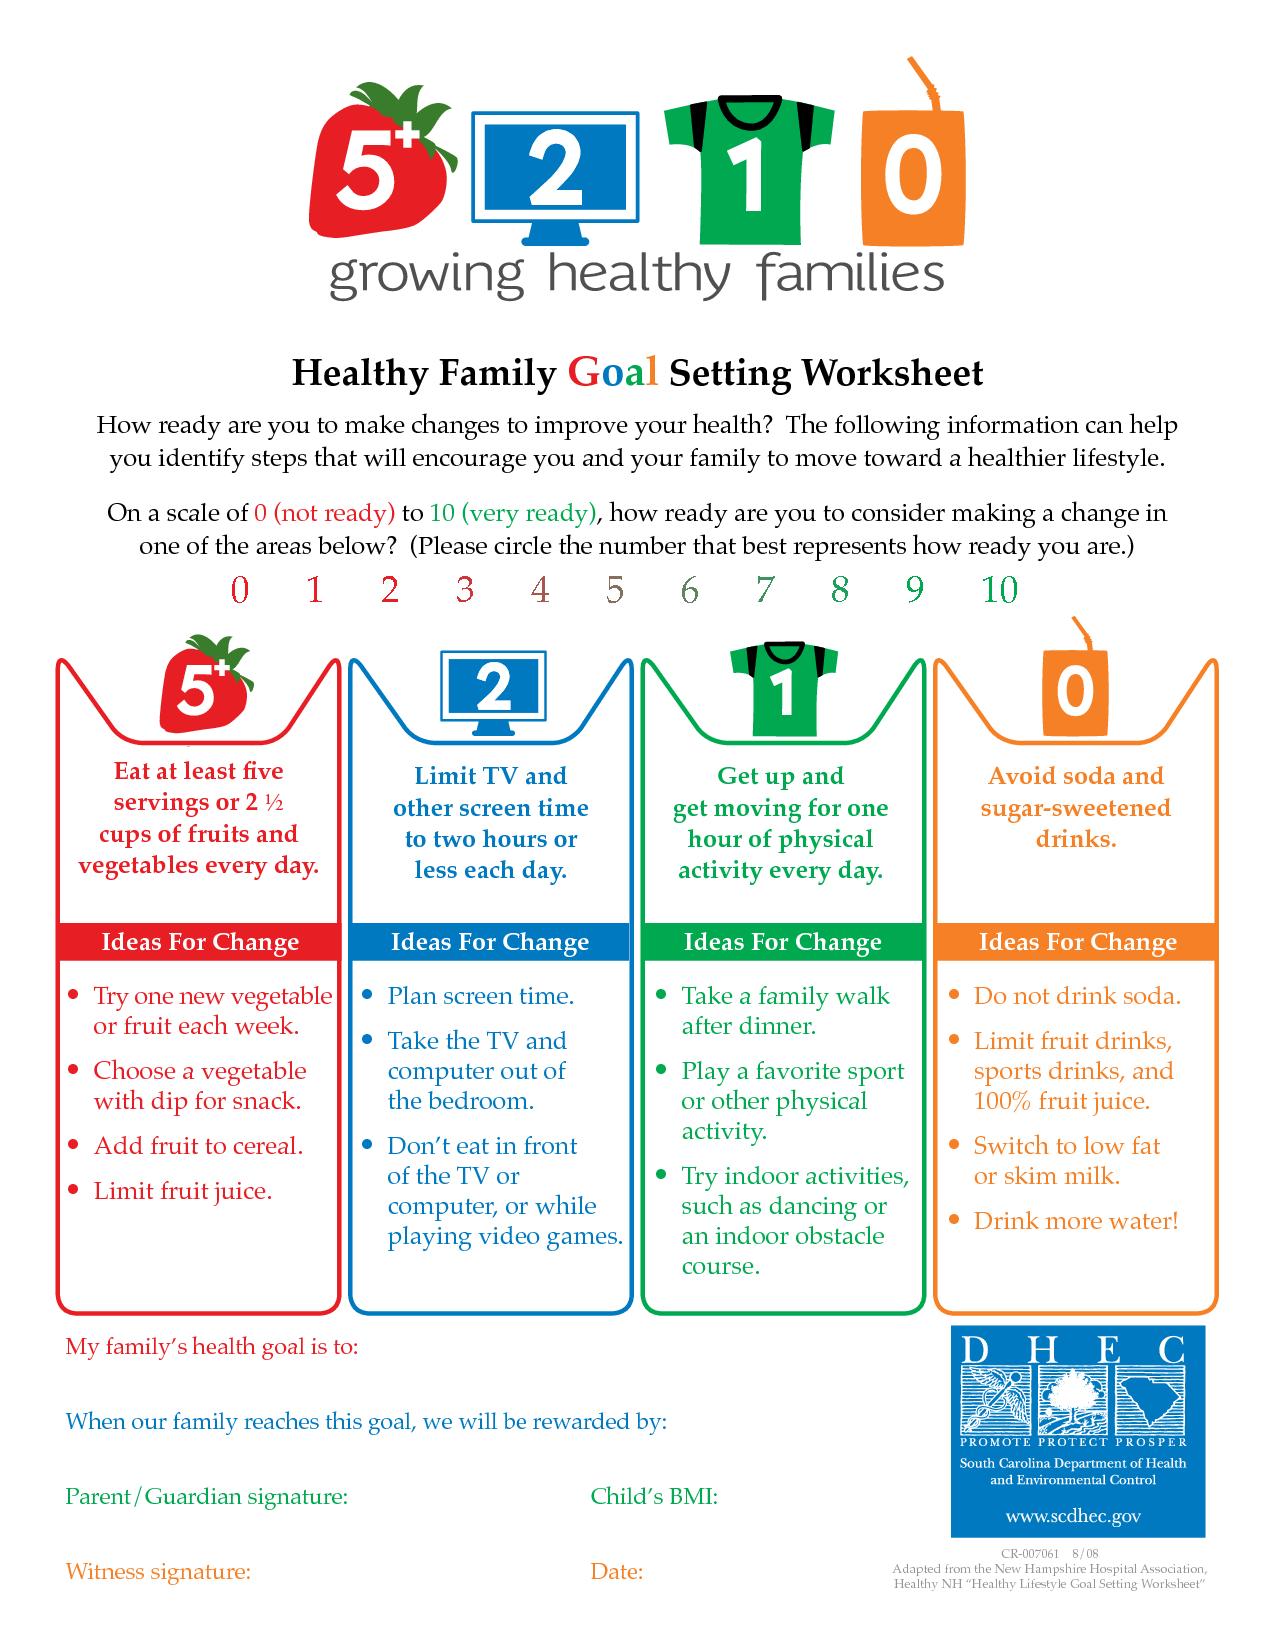 Goal Setting Worksheets | Healthy Lifestyle Goal Setting ...